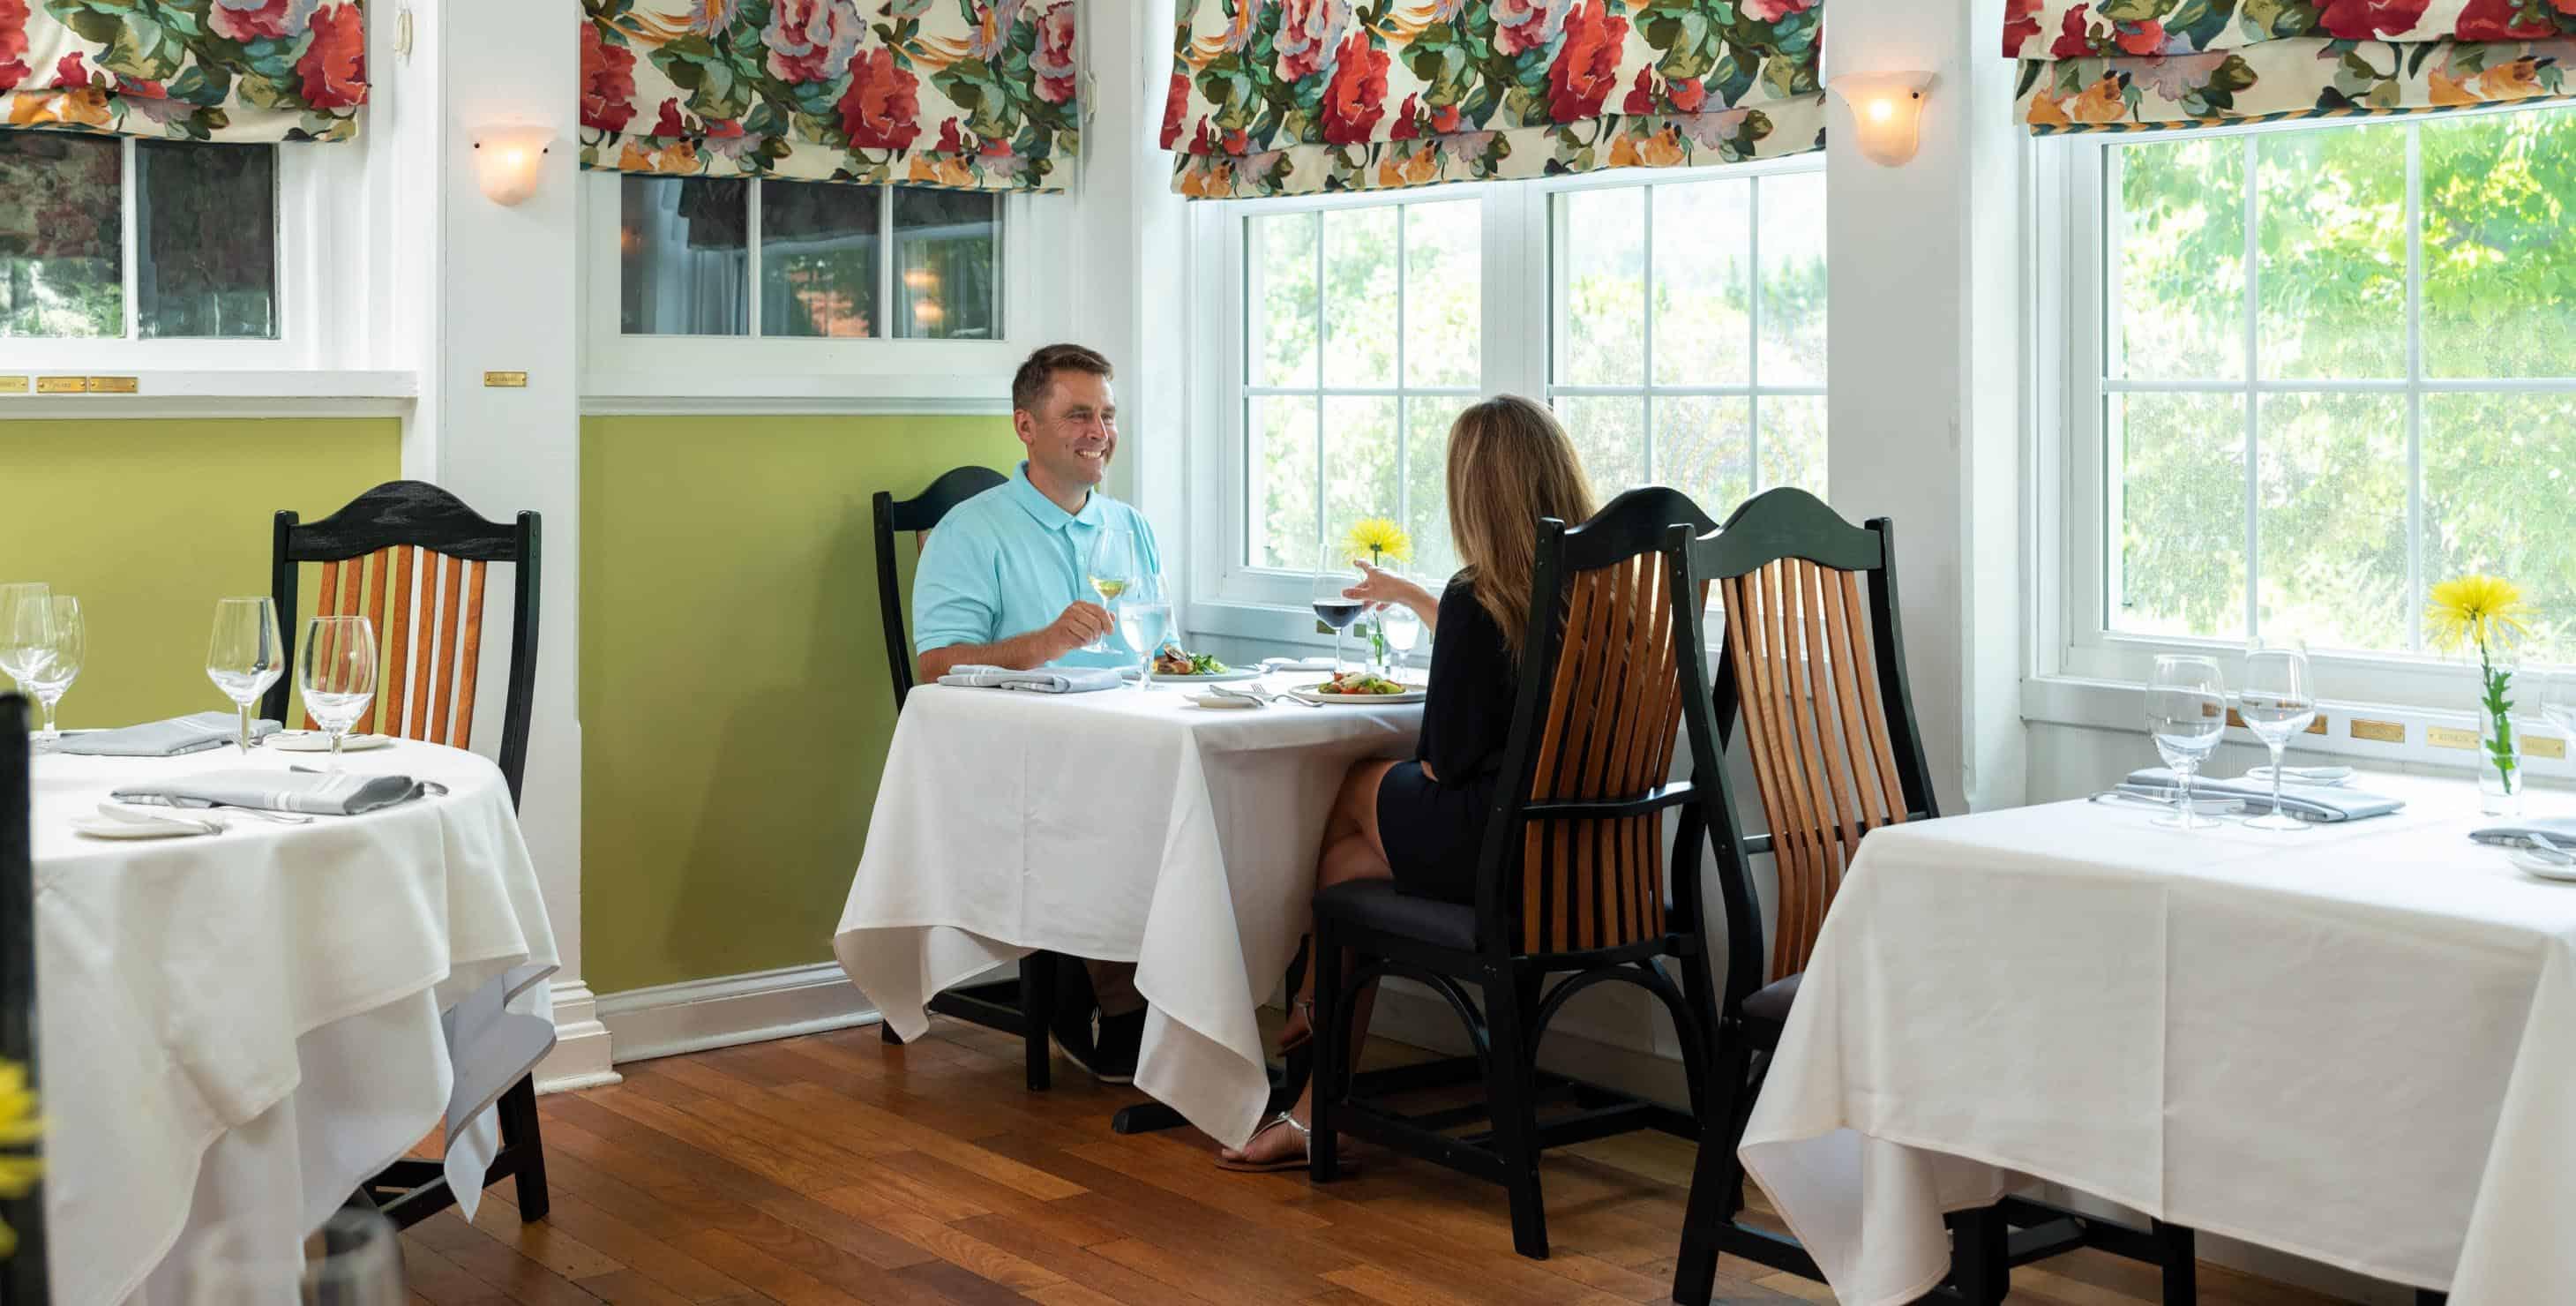 Romantic Restaurant In Northern Virginia Gourmet Fine Dining